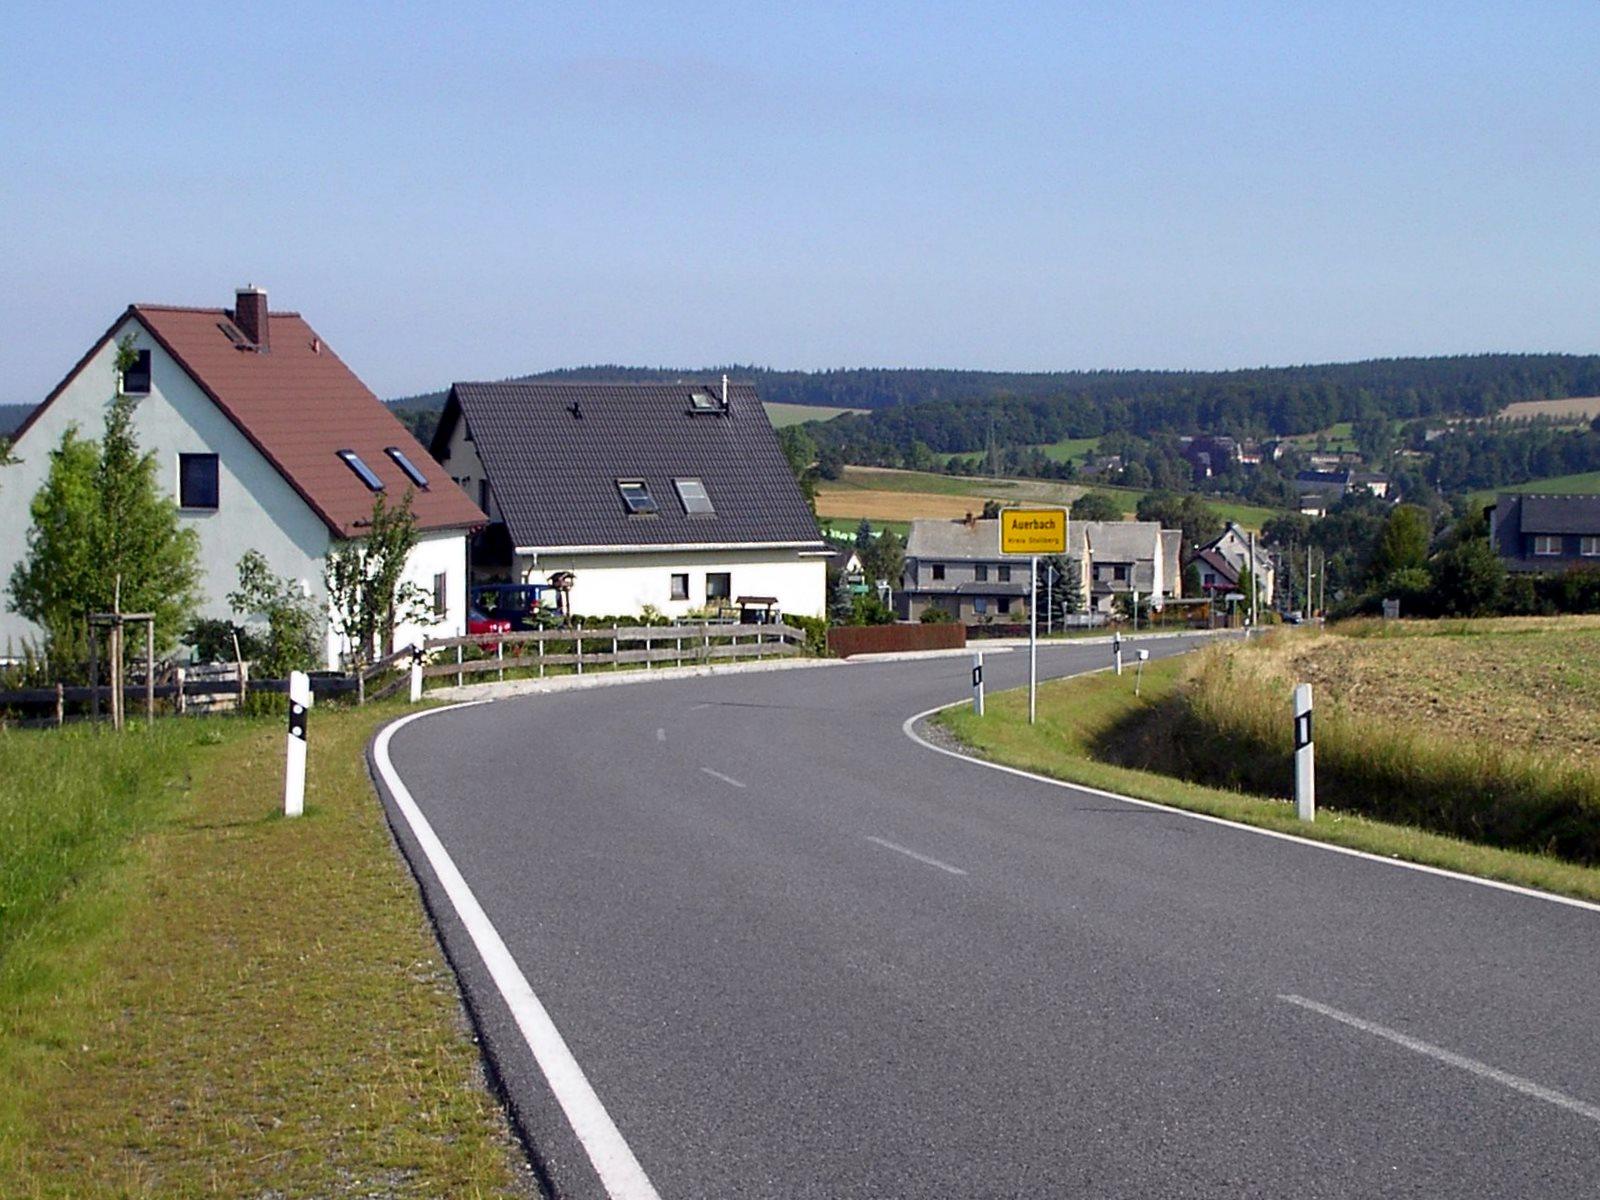 Auerbach (Sassonia)